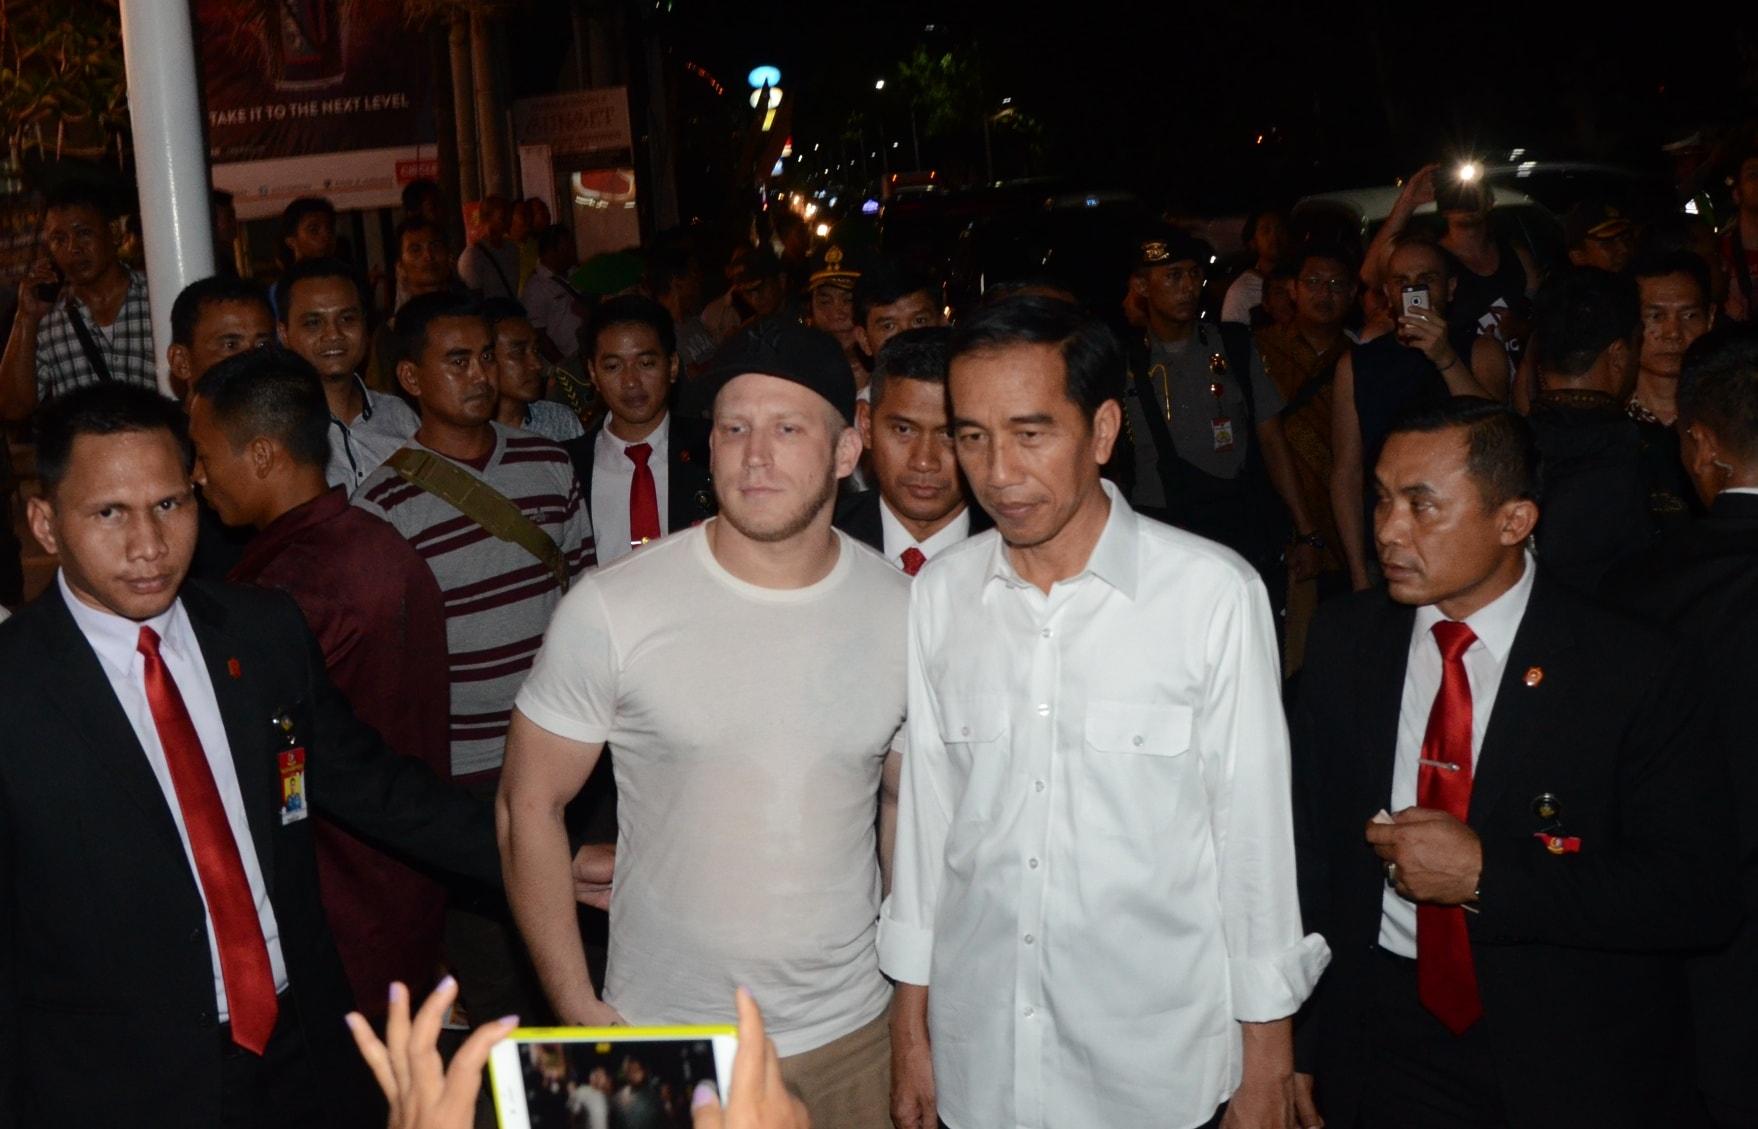 Wisatawan mancanegara berebut foto bersama Presiden Jokowi saat blusukan ke Beach Walk Mall, Kuta, Kabupaten Badung, Bali, Jumat (24/2) malam. (Foto: Humas/Jay)